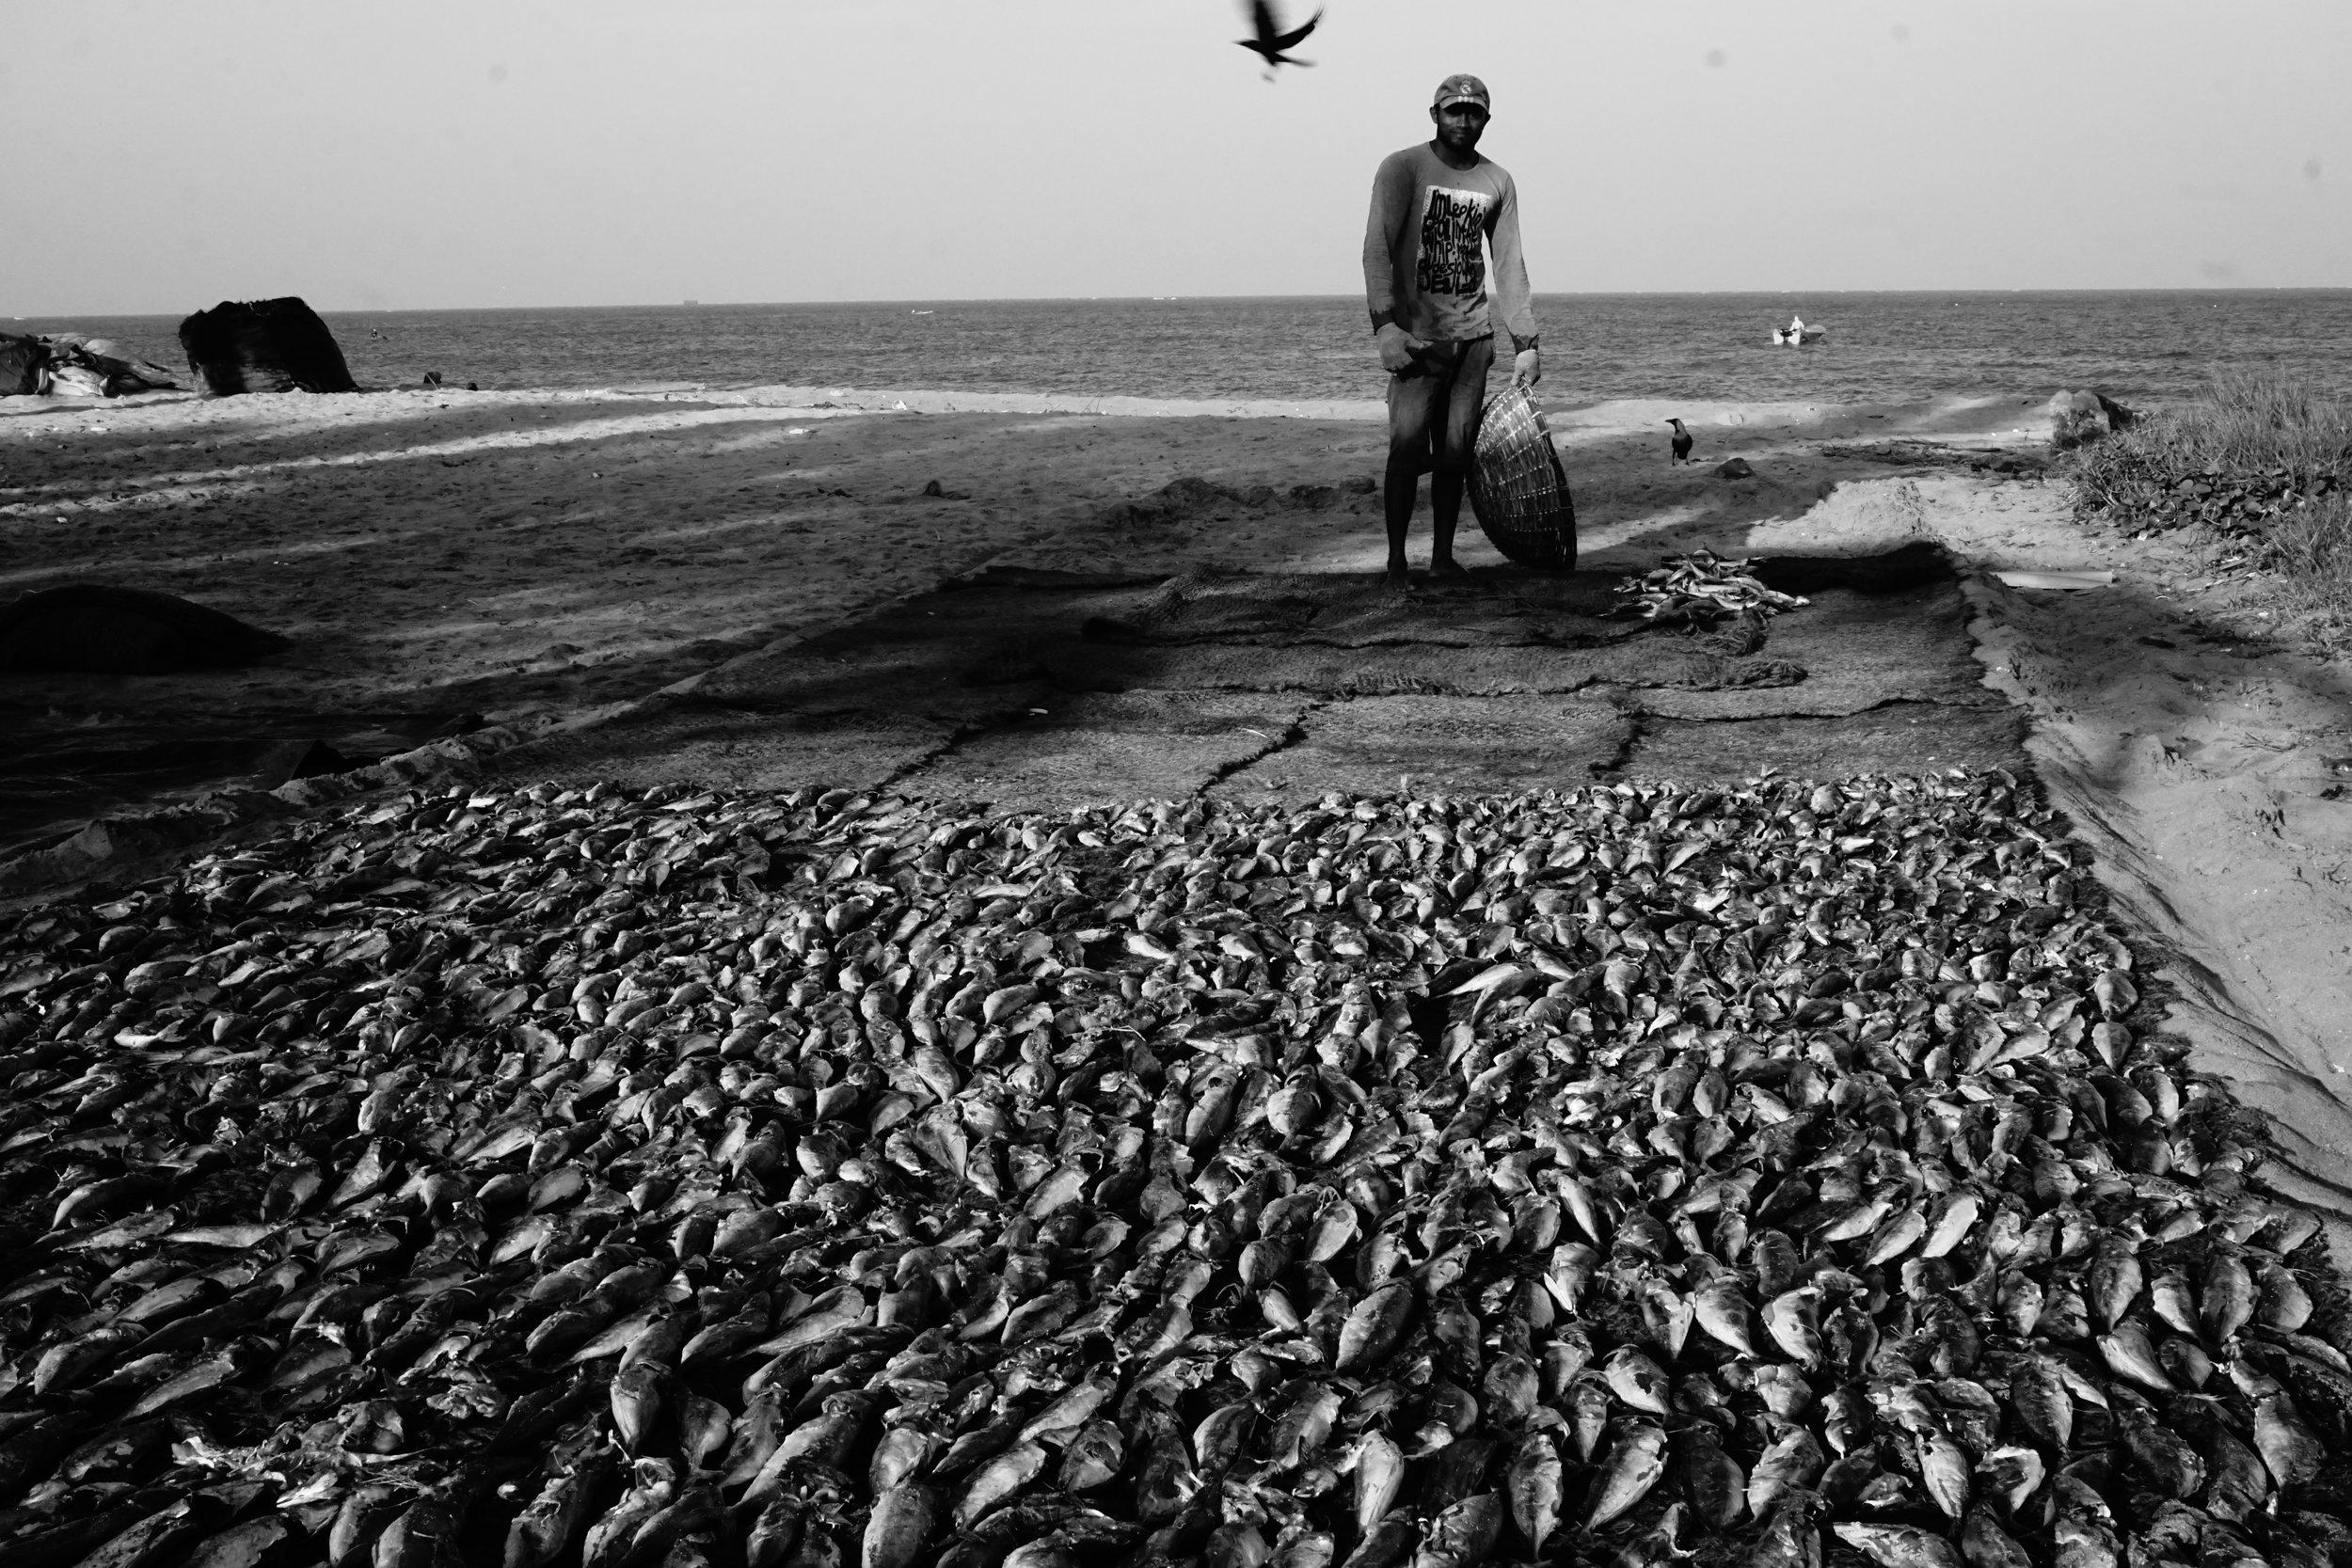 Negombo, Sri Lanka (2016)